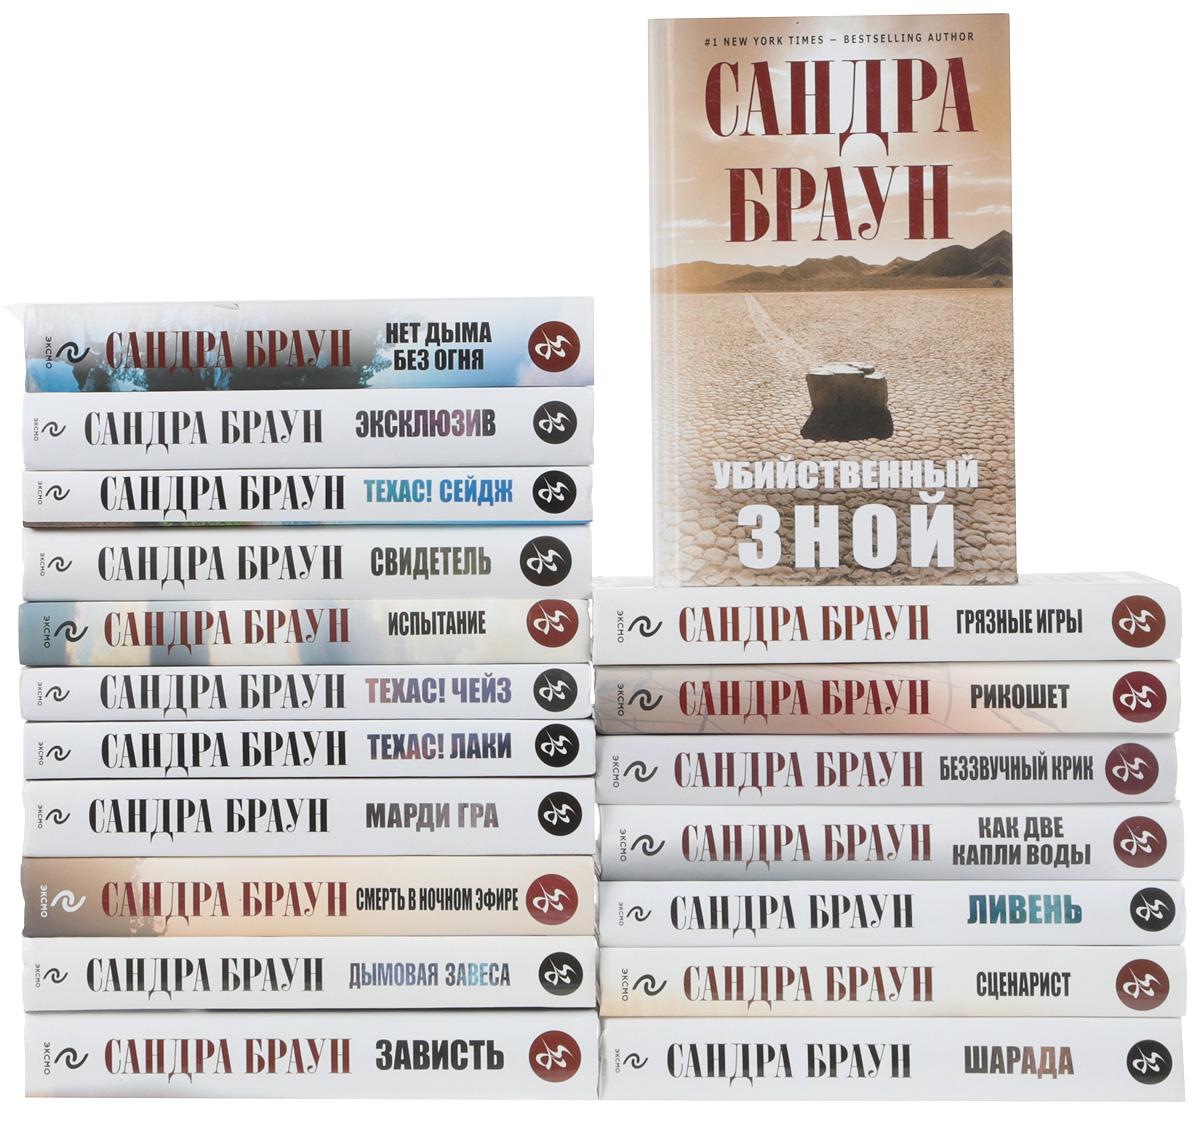 "Браун С. Сандра Браун. Серия ""#1 New York Times - Bestselling Author"" (комплект из 19 книг)"